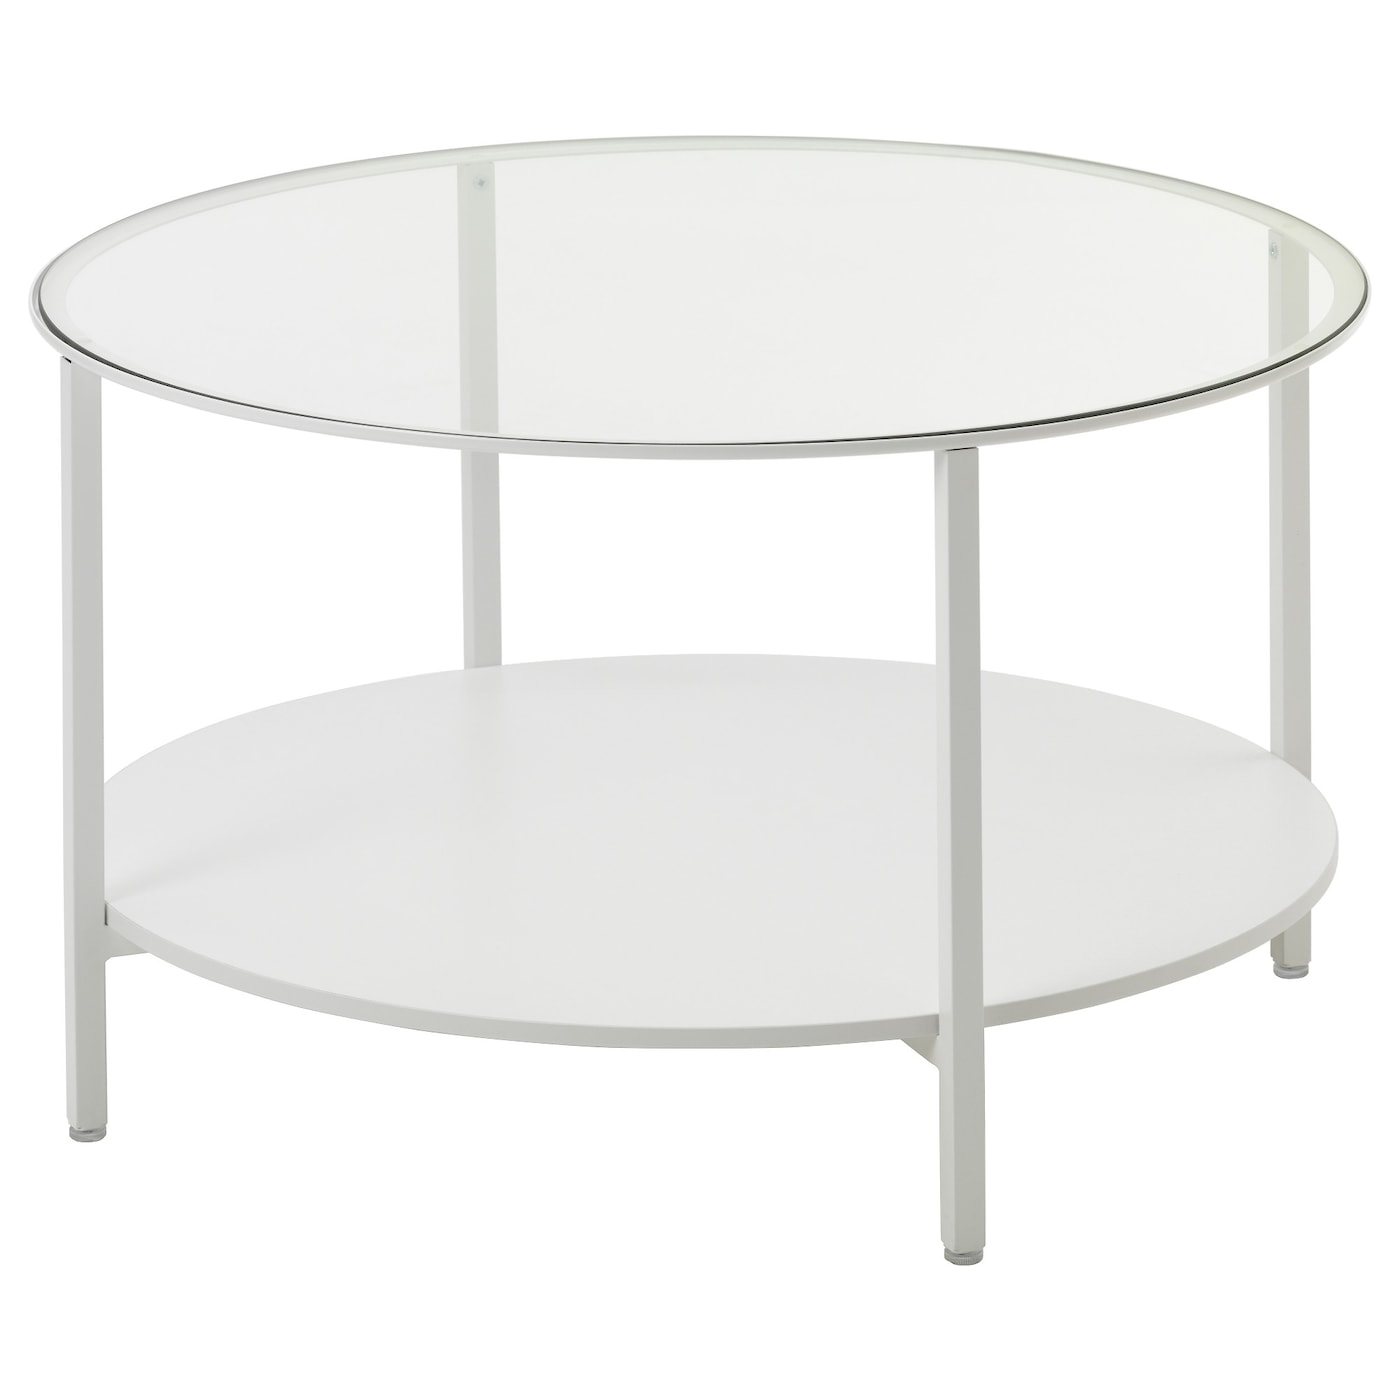 VITTSJÖ Coffee Table White/glass 75 Cm